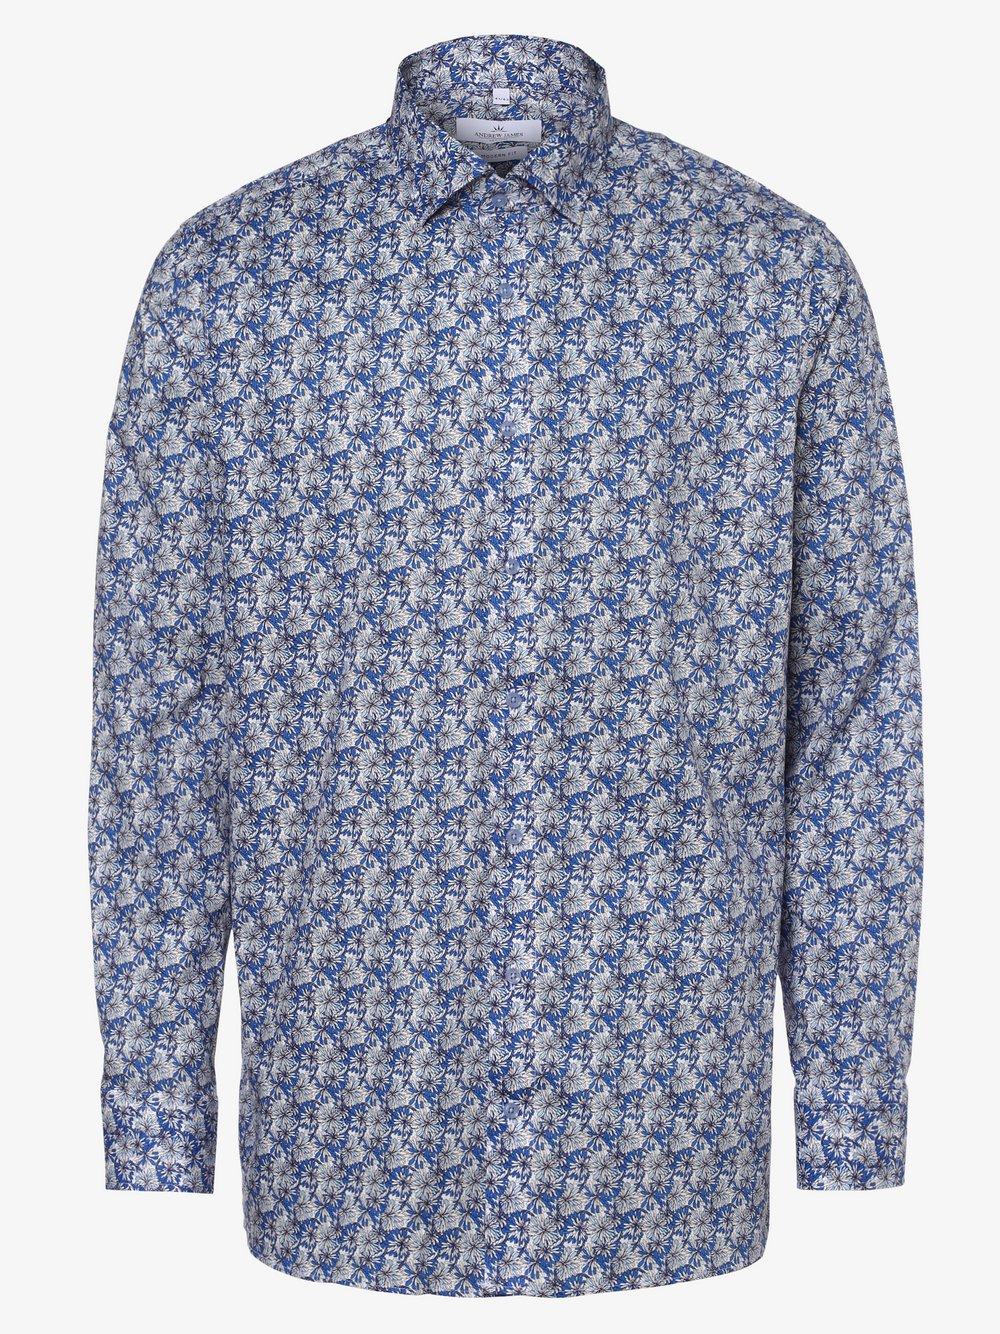 Andrew James New York Koszula męska – Ted kup online  9X3Vy